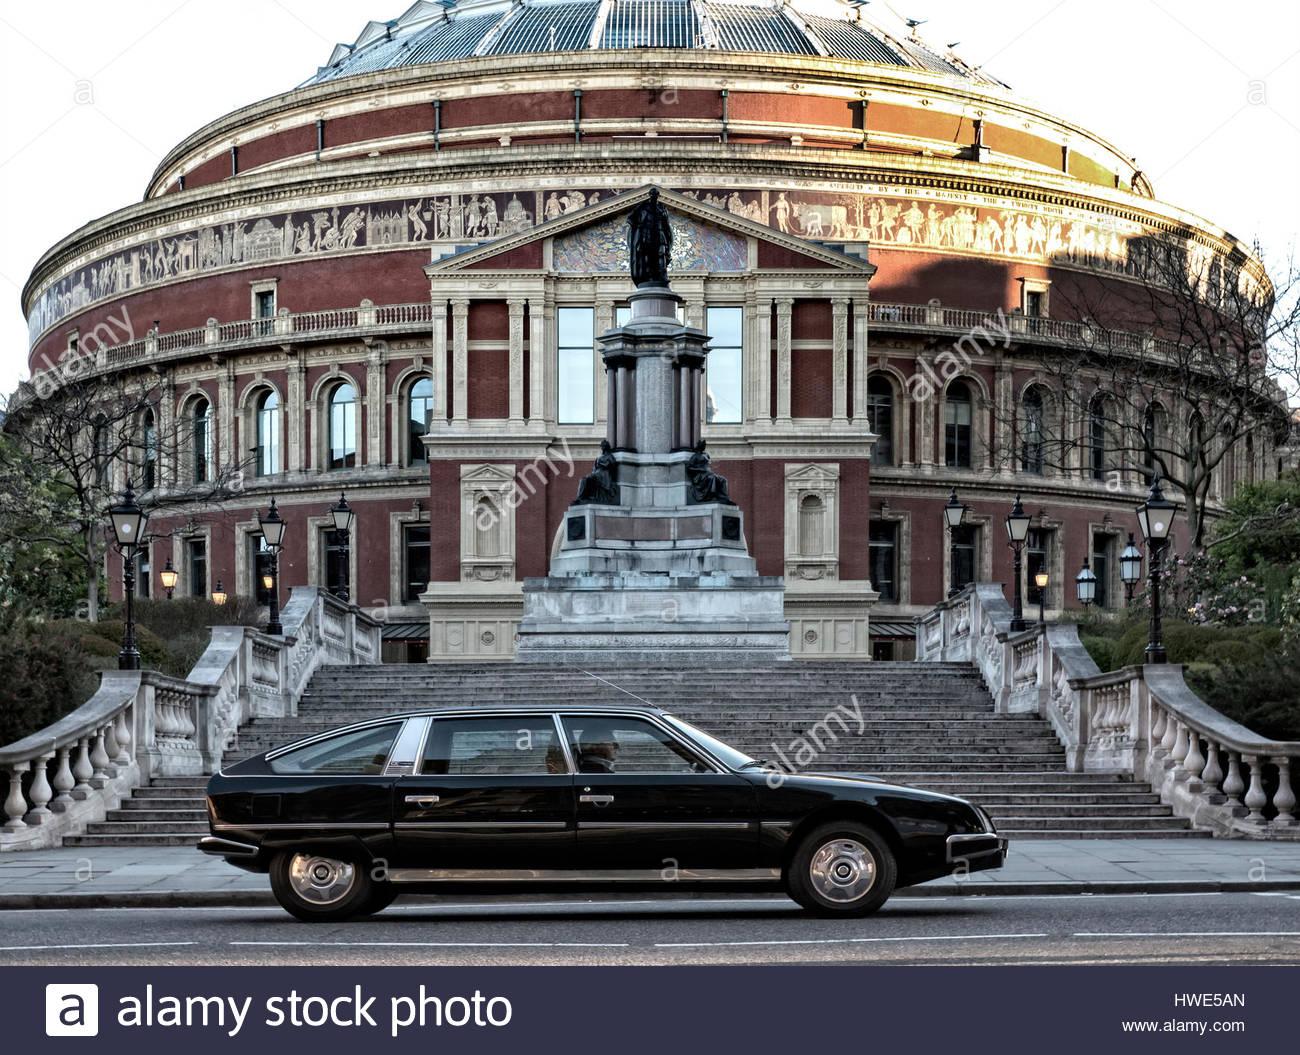 1976-citroen-cx-prestige-at-the-royal-albert-hall-london-uk-HWE5AN.jpg